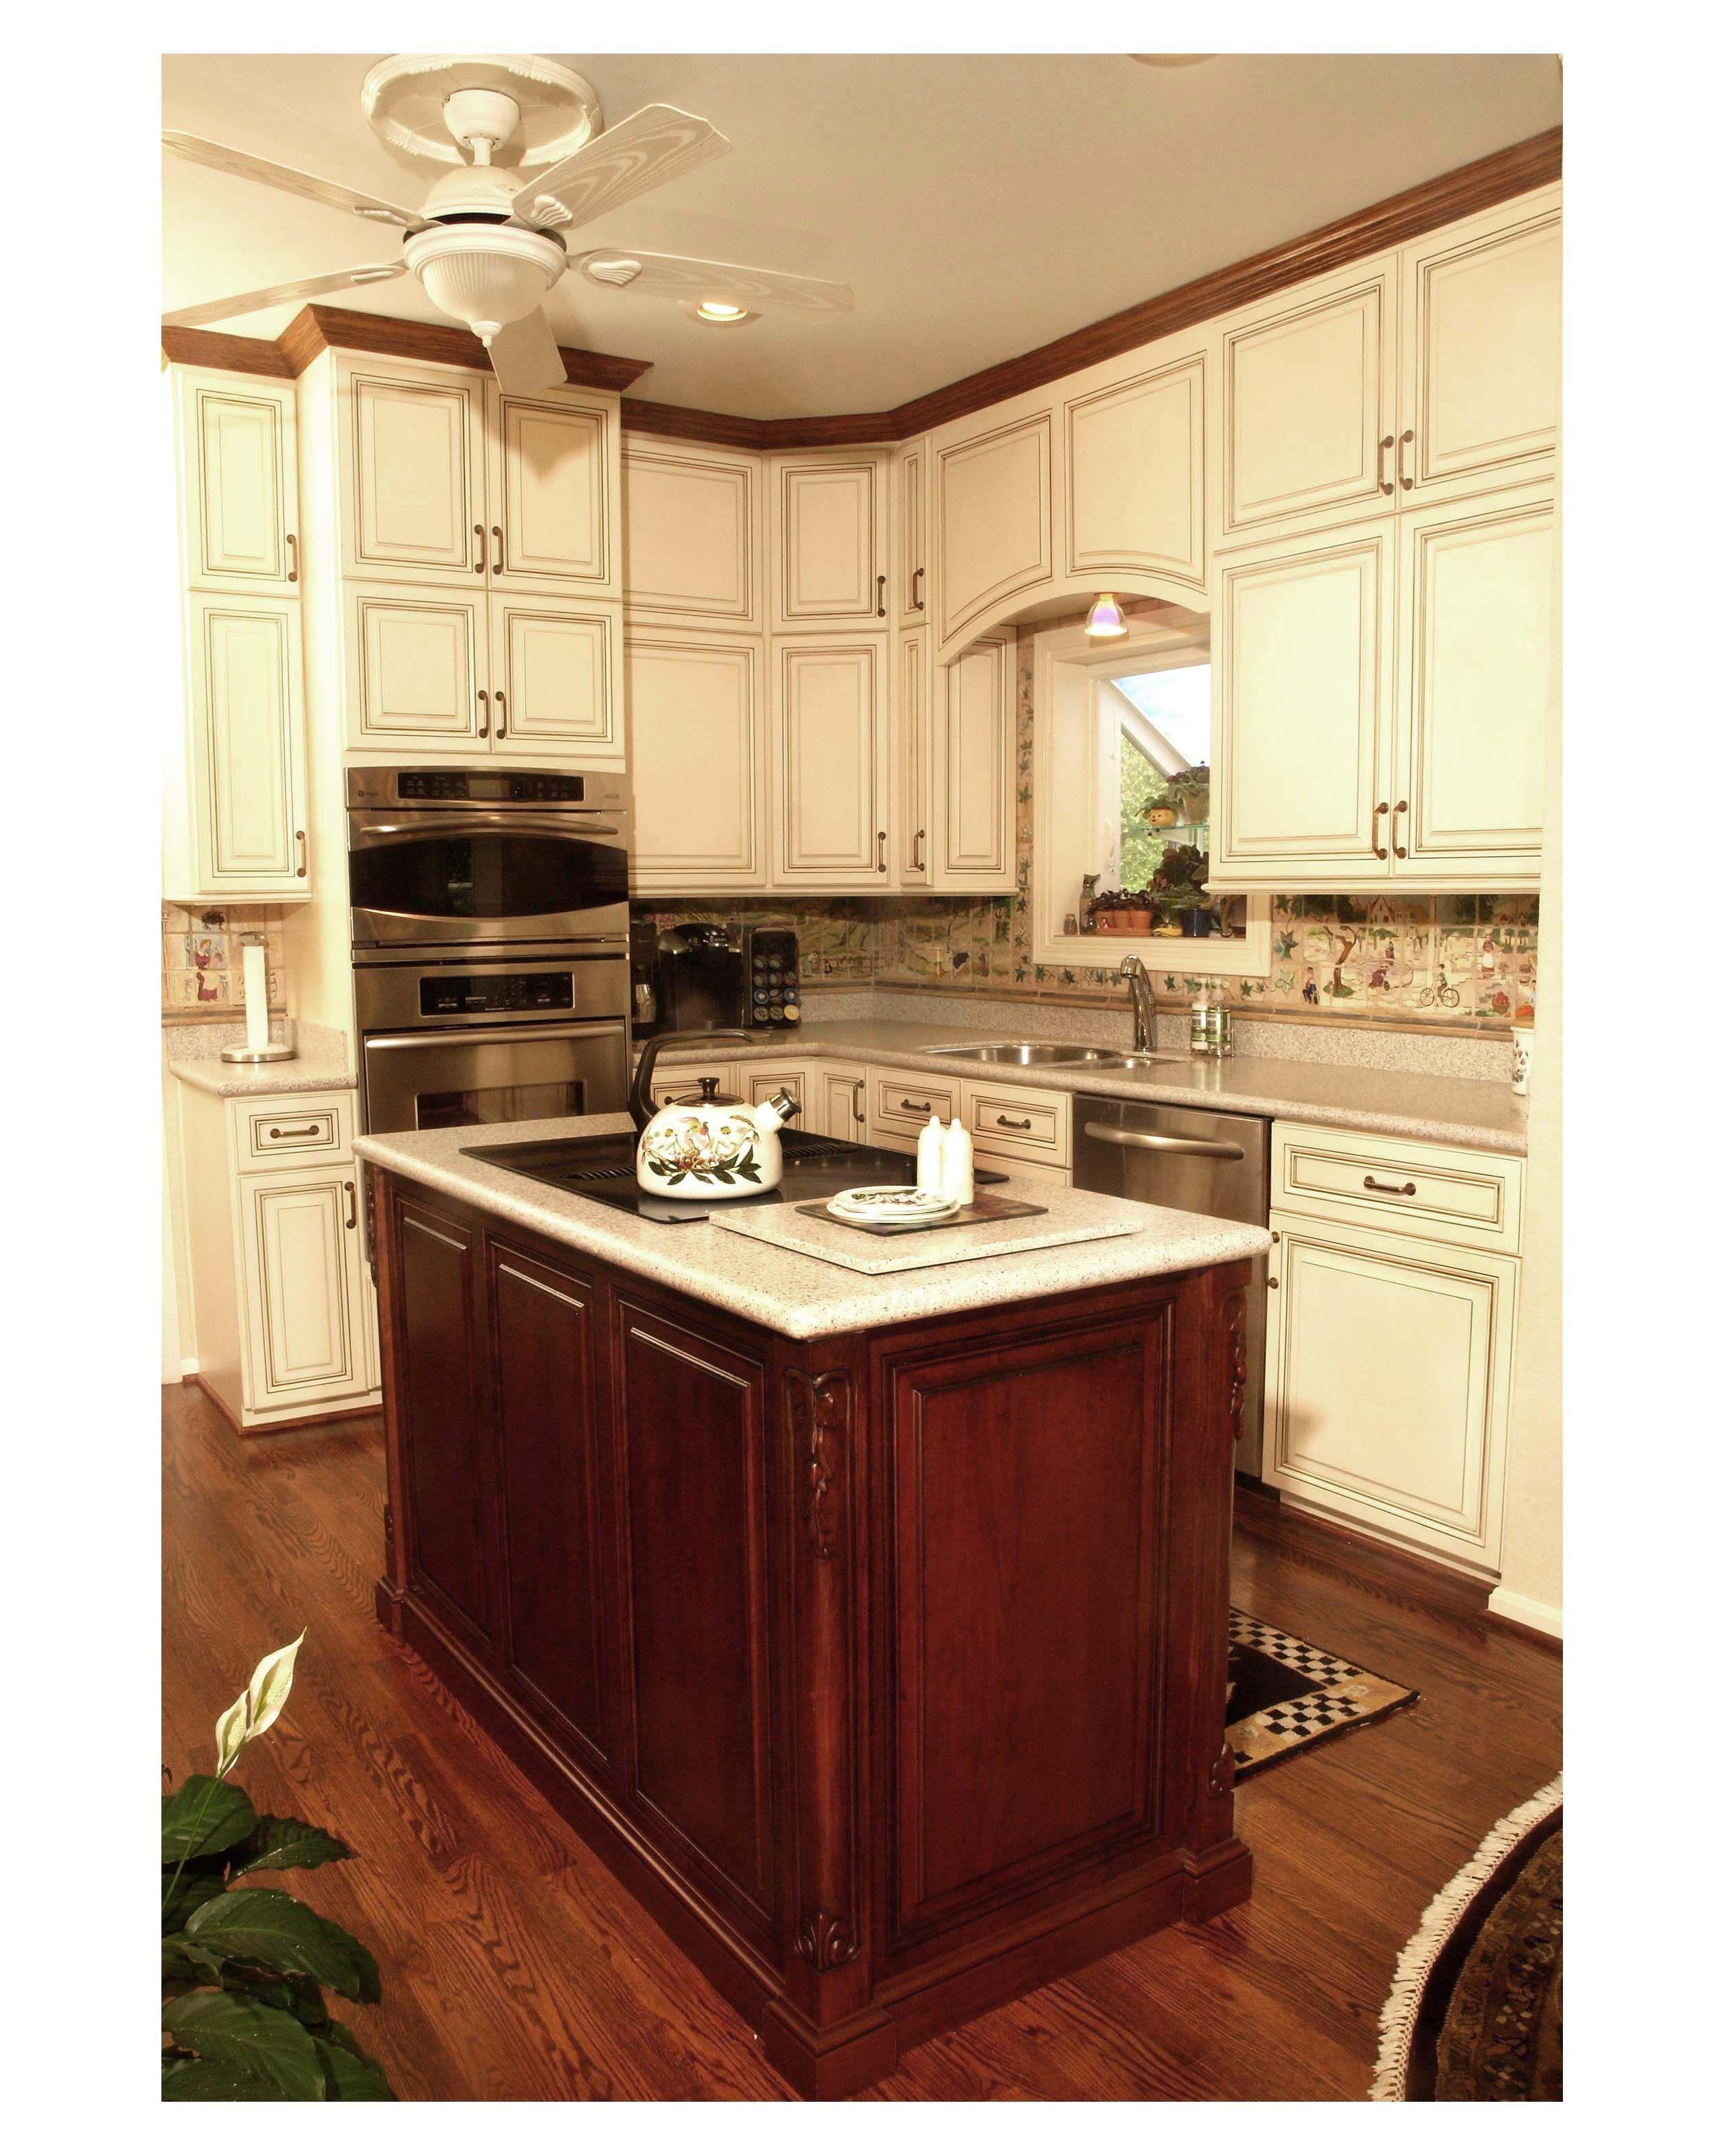 Renew Kitchen Cabinets: Custom Cabinet Renewal